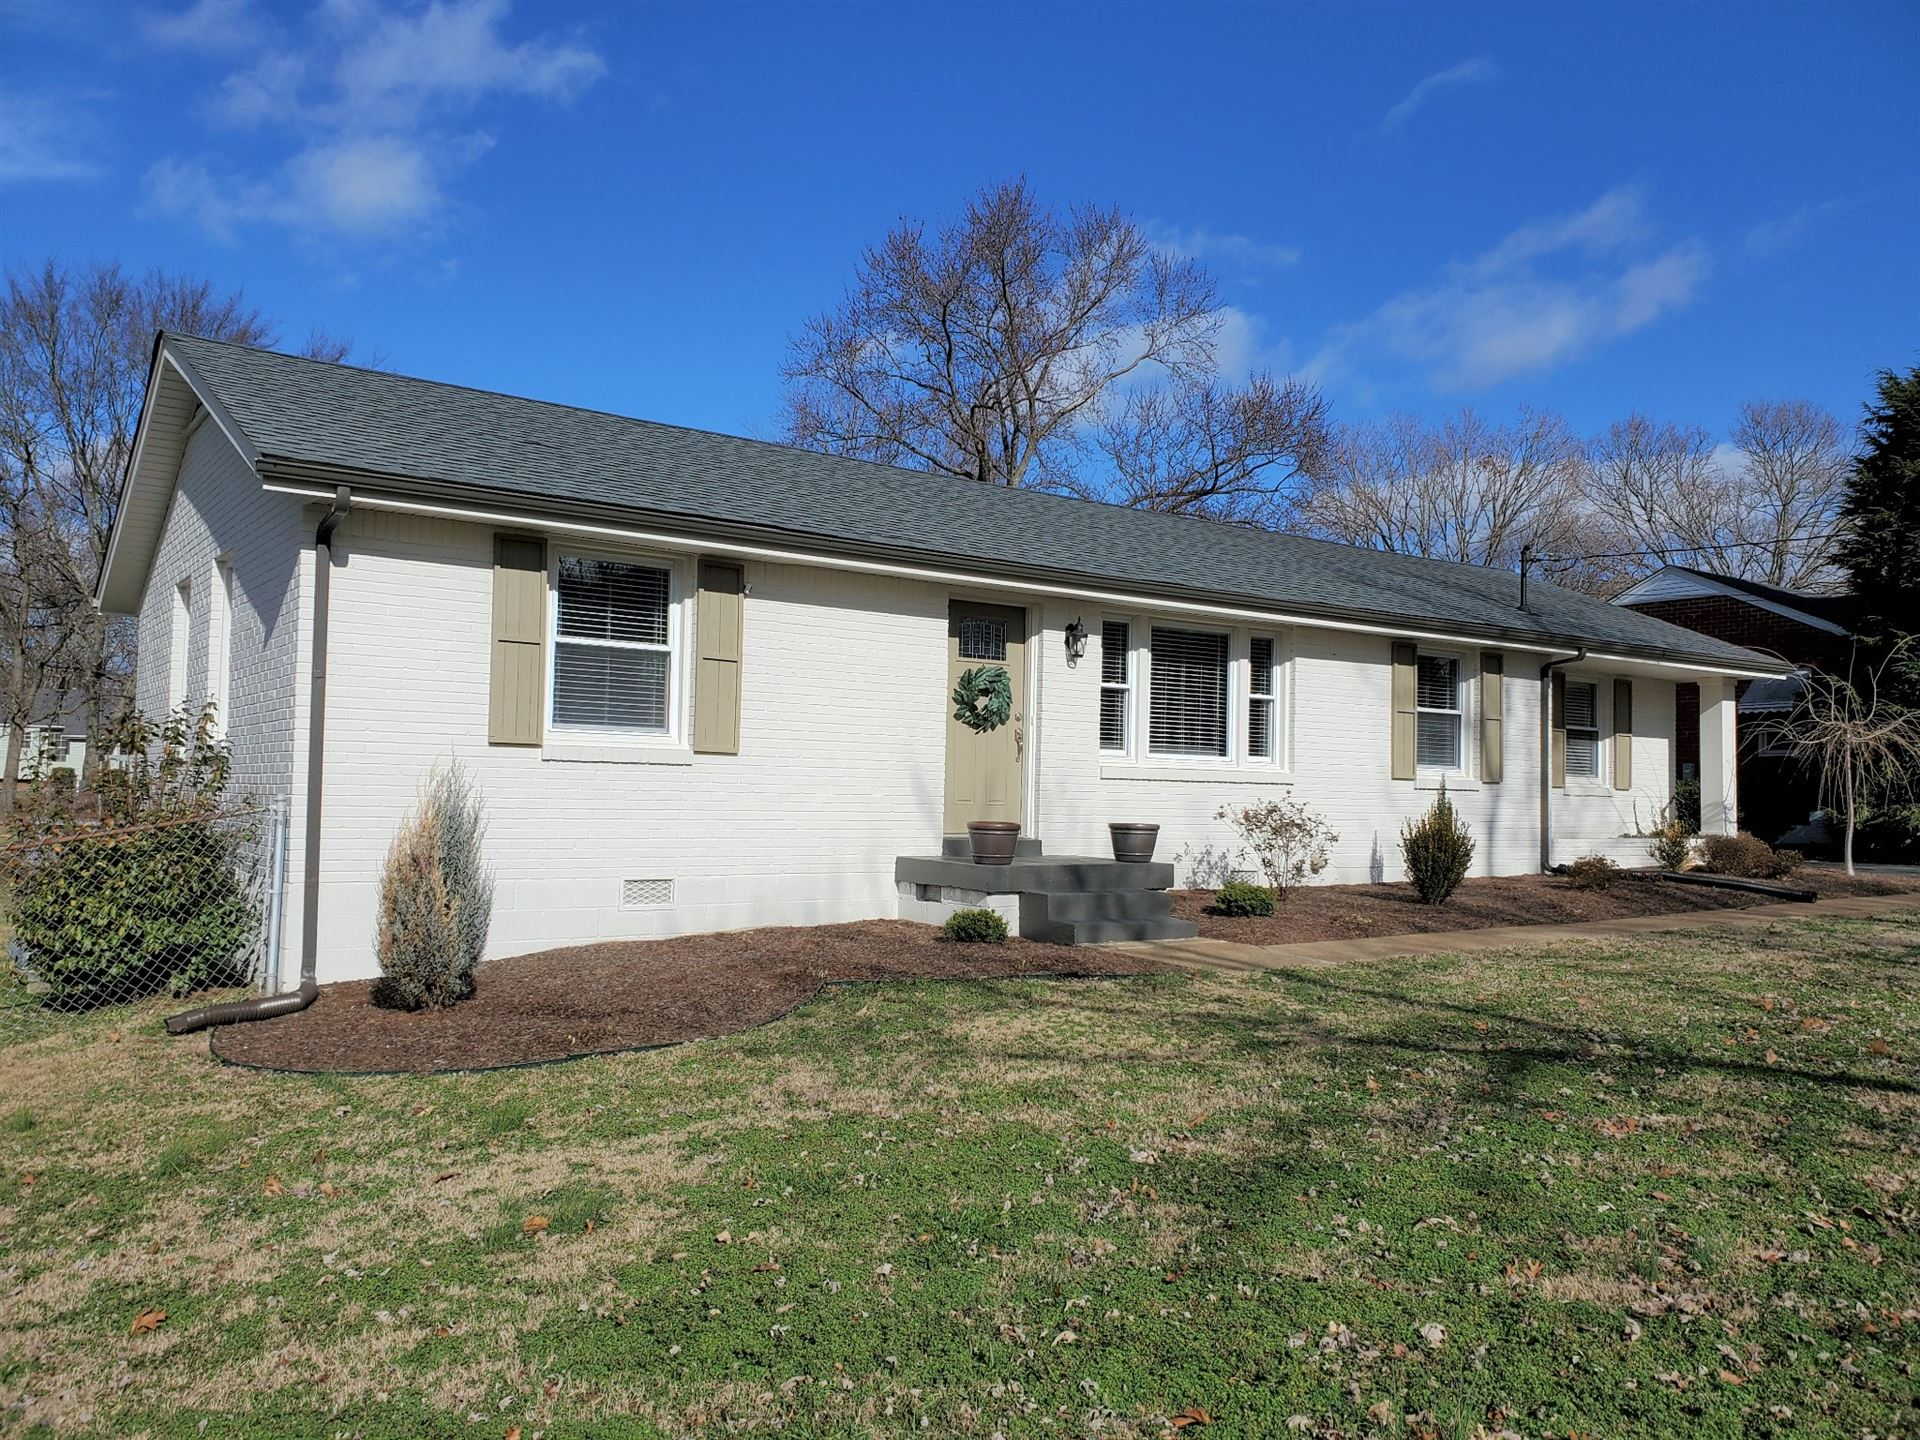 554 Watsonwood Dr, Nashville, TN 37211 - MLS#: 2217893